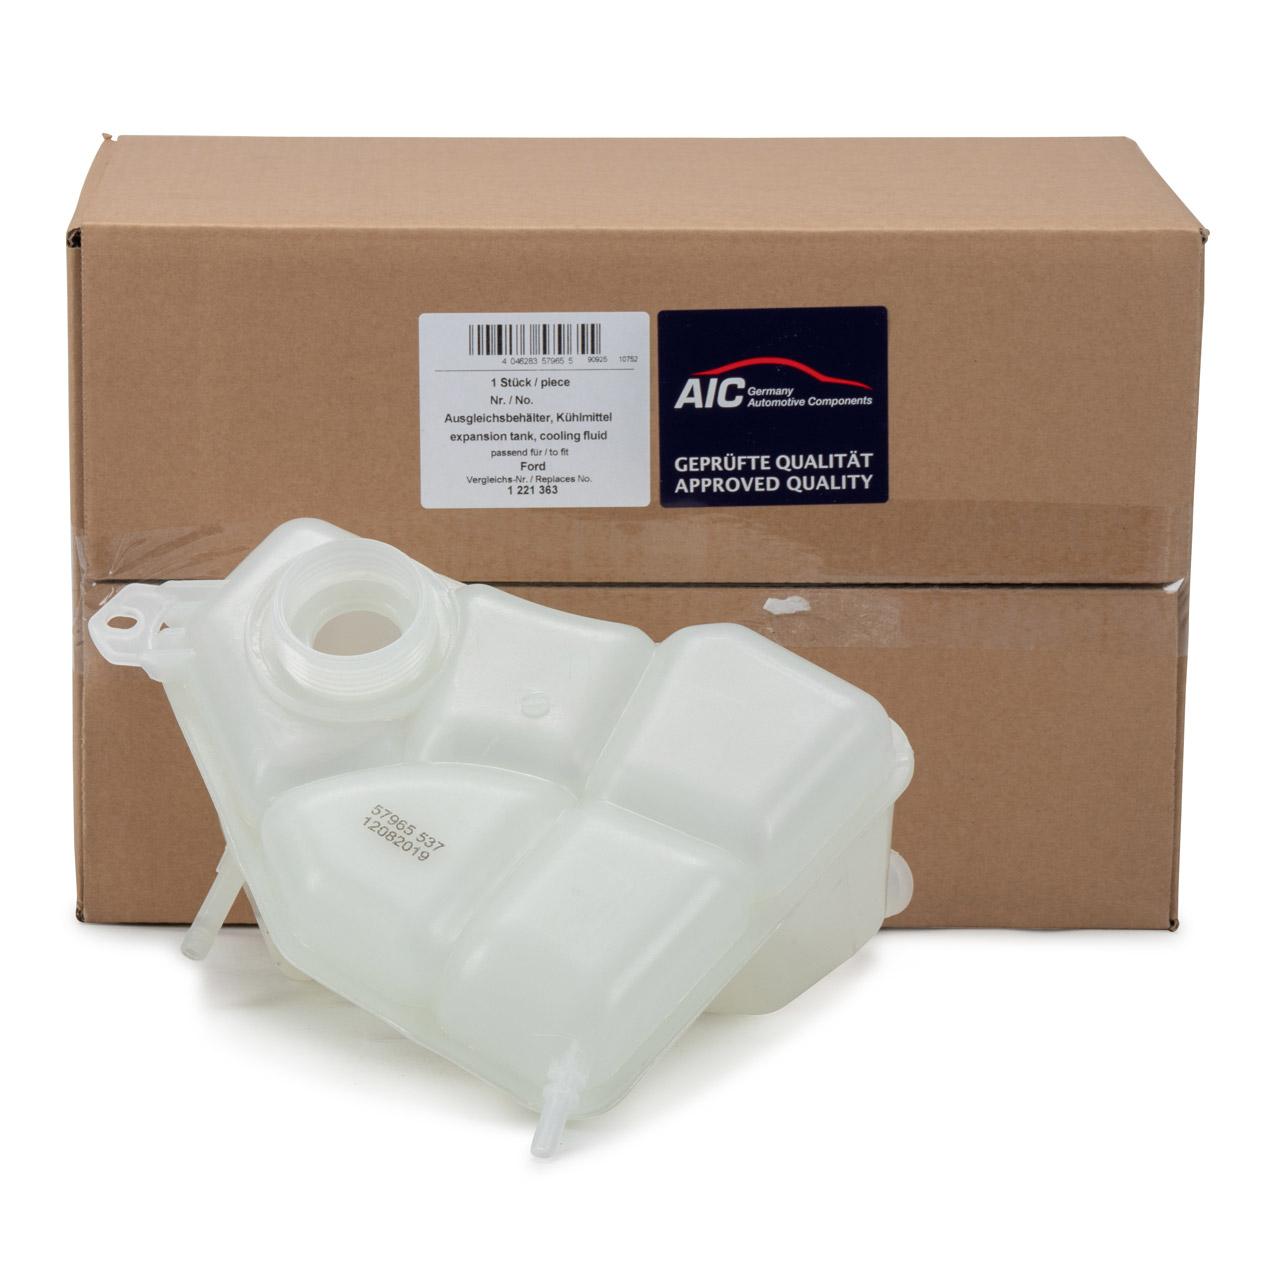 AIC Ausgleichsbehälter Kühlmittelbehälter FORD Fiesta 5 Fusion 1.3 1.4 TDCi 1221363